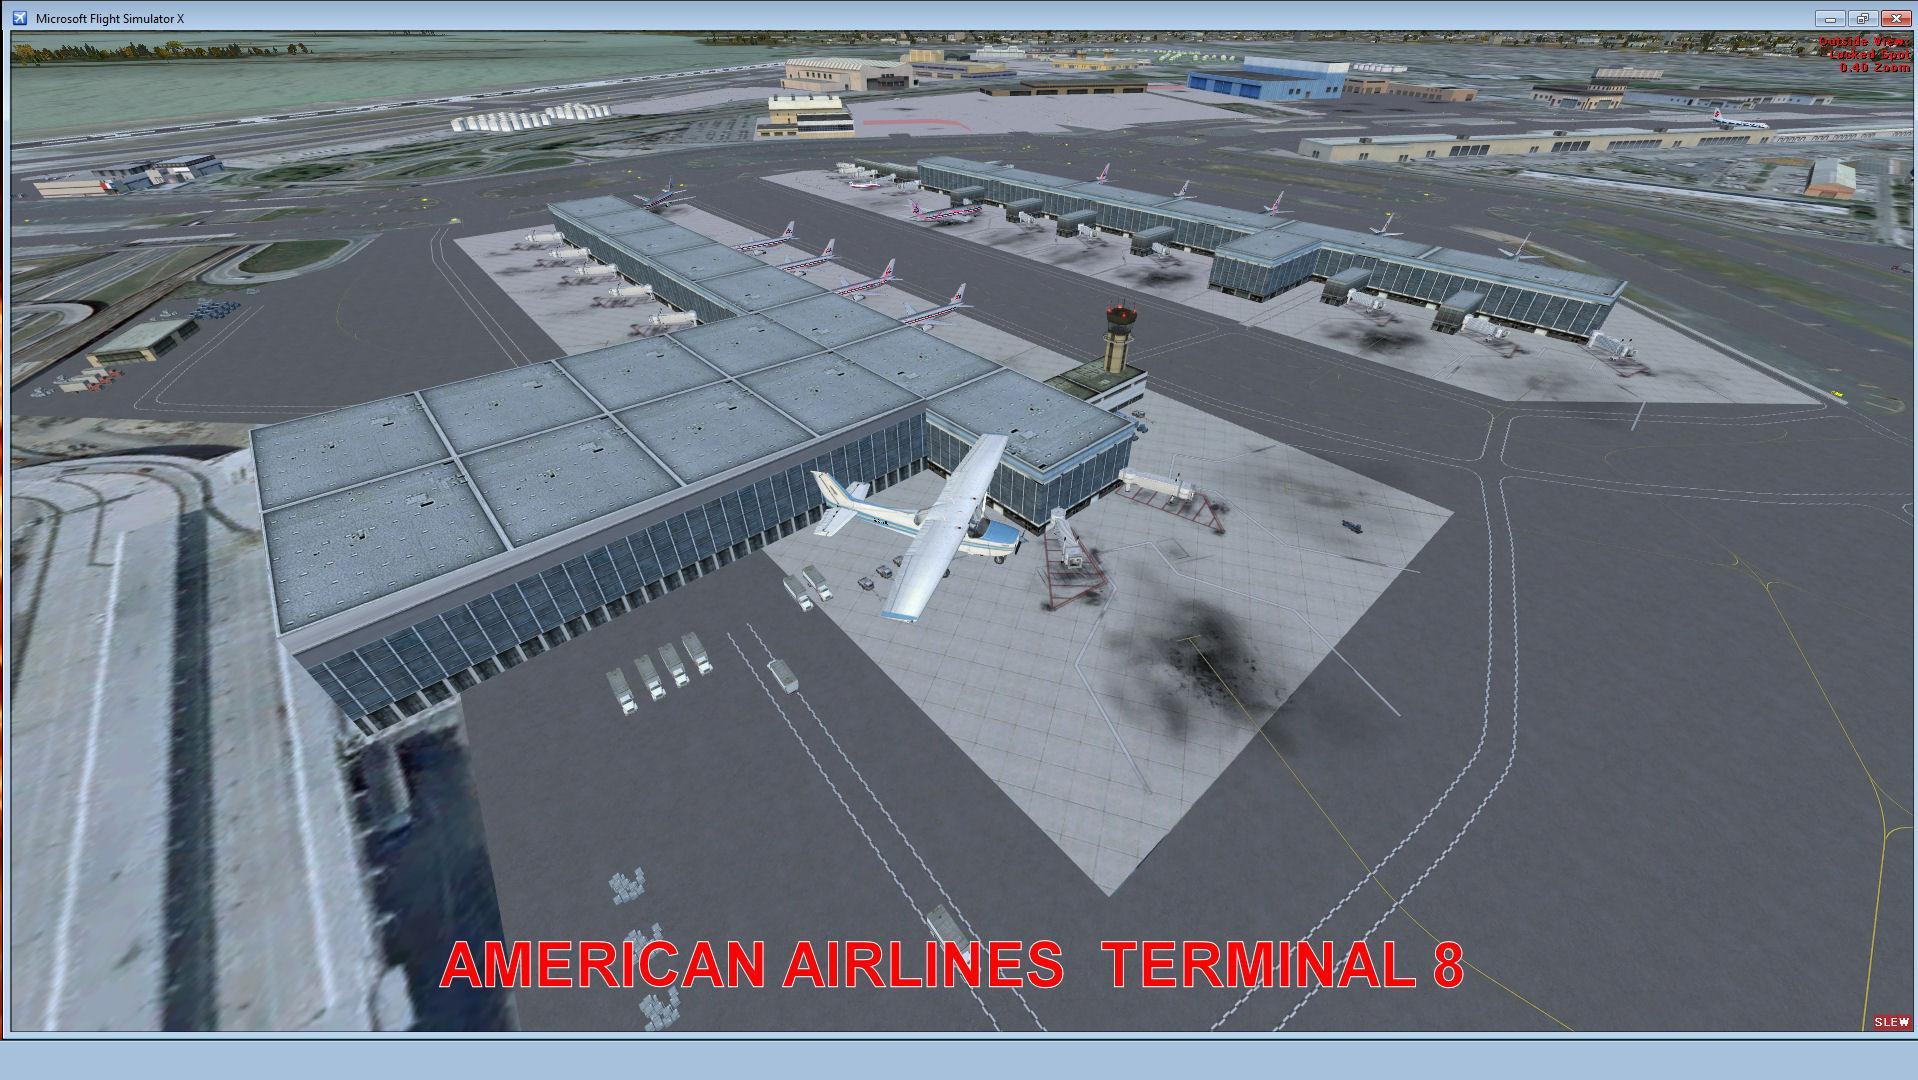 Aeroporto Jfk : Download jfk photo real scenery fsx & p3d rikoooo